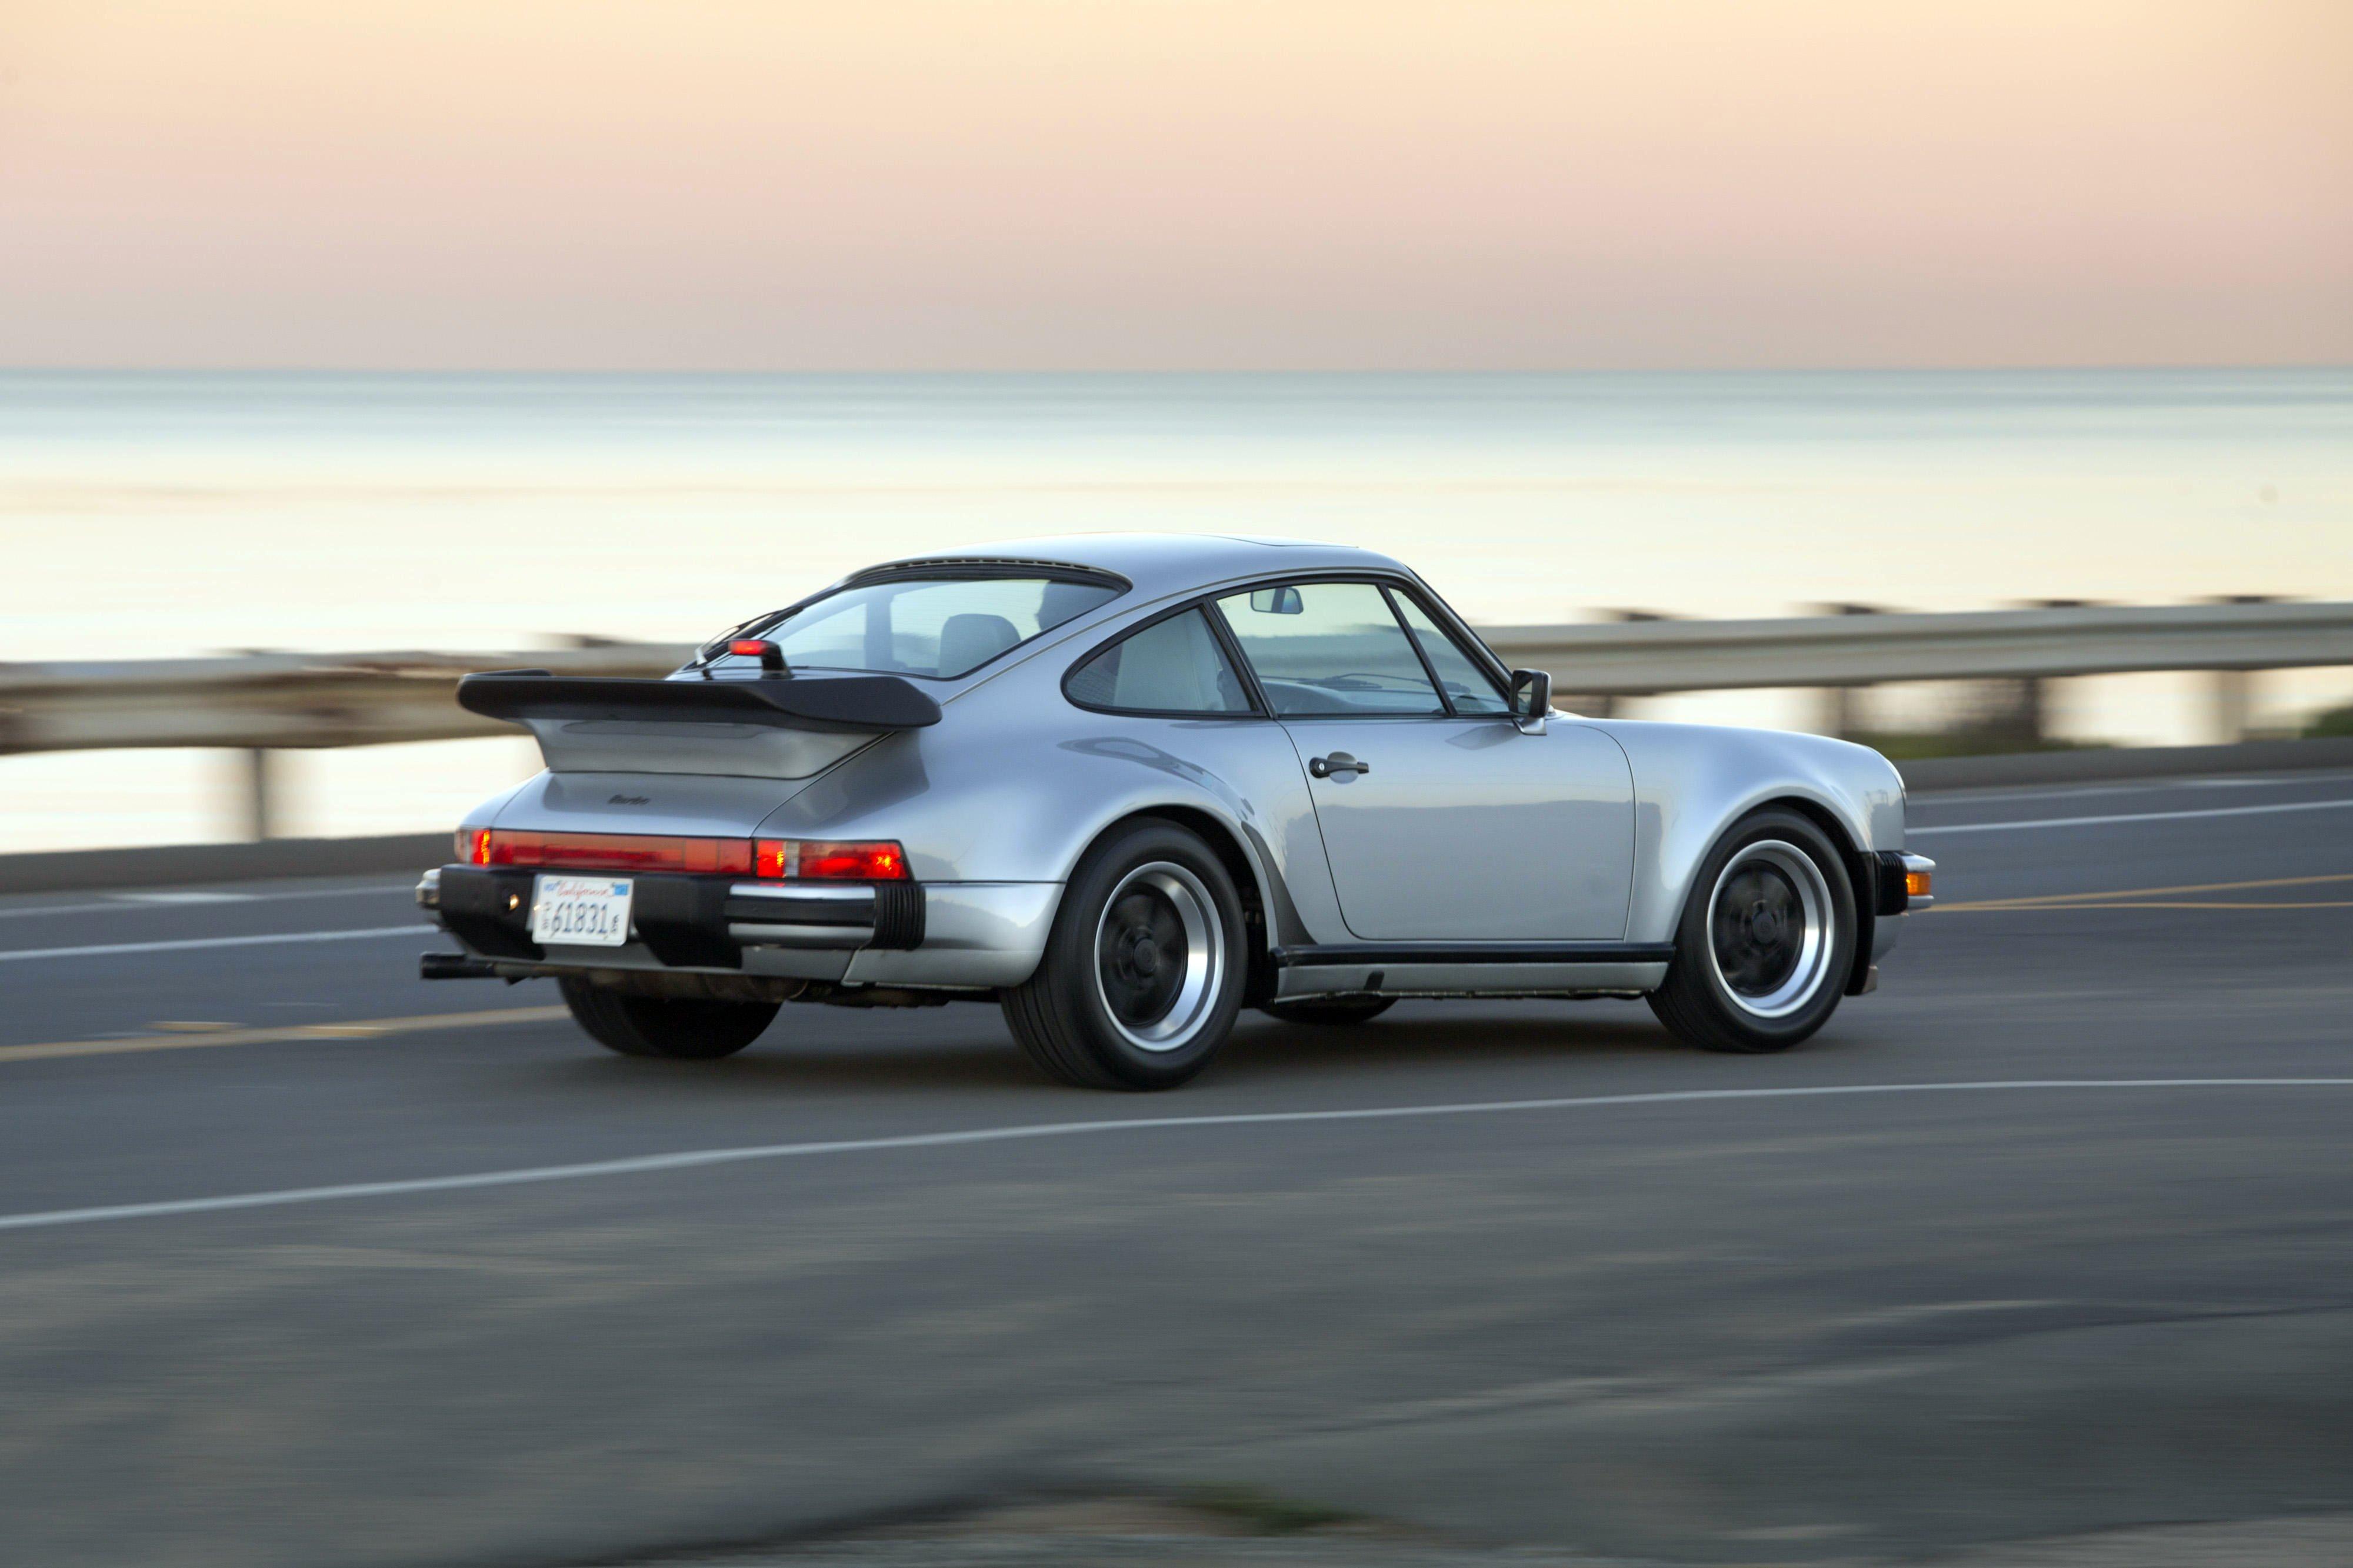 1987 porsche 911 turbo 3 3 coupe us spec 930 supercar wallpaper 4000x2666 557650 wallpaperup